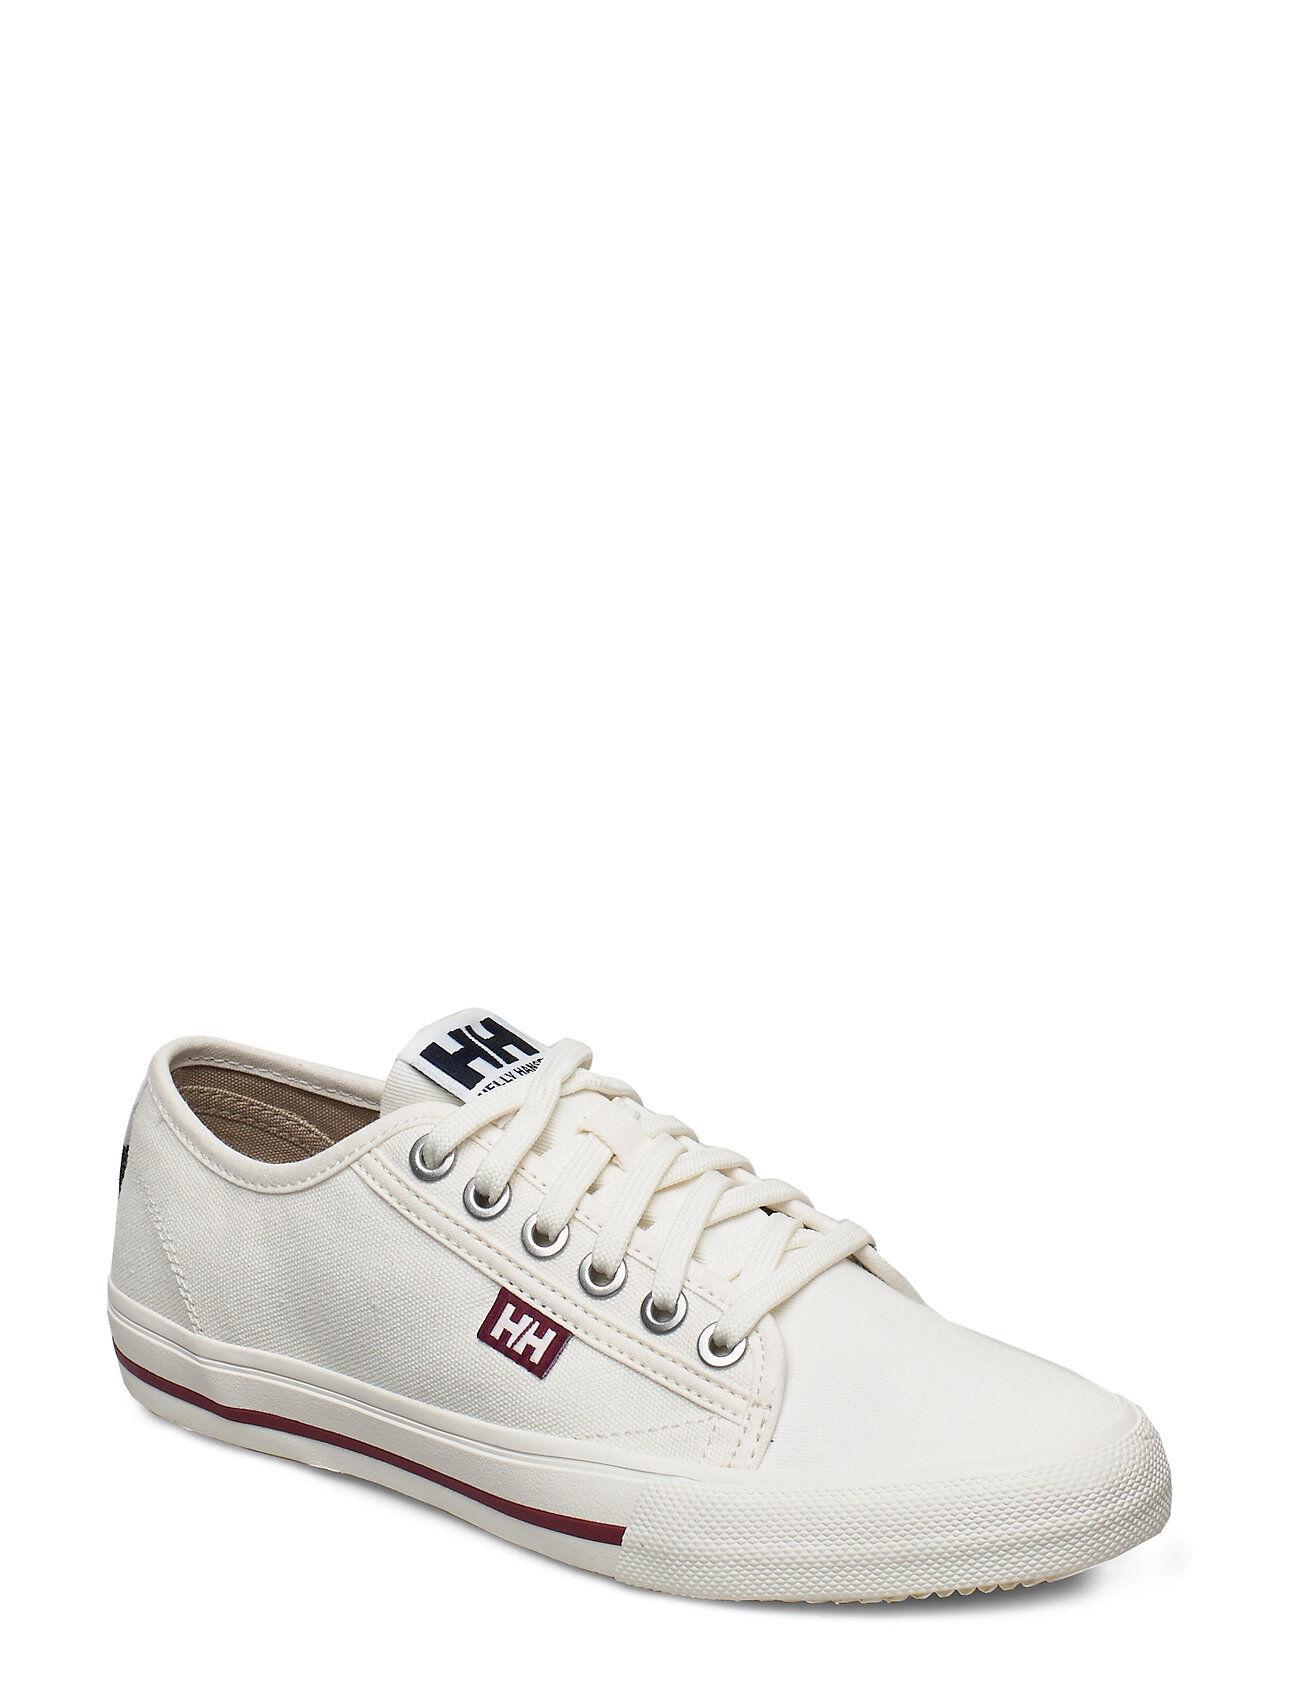 Image of Helly Hansen W Fjord Canvas Shoe V2 Matalavartiset Sneakerit Tennarit Valkoinen Helly Hansen